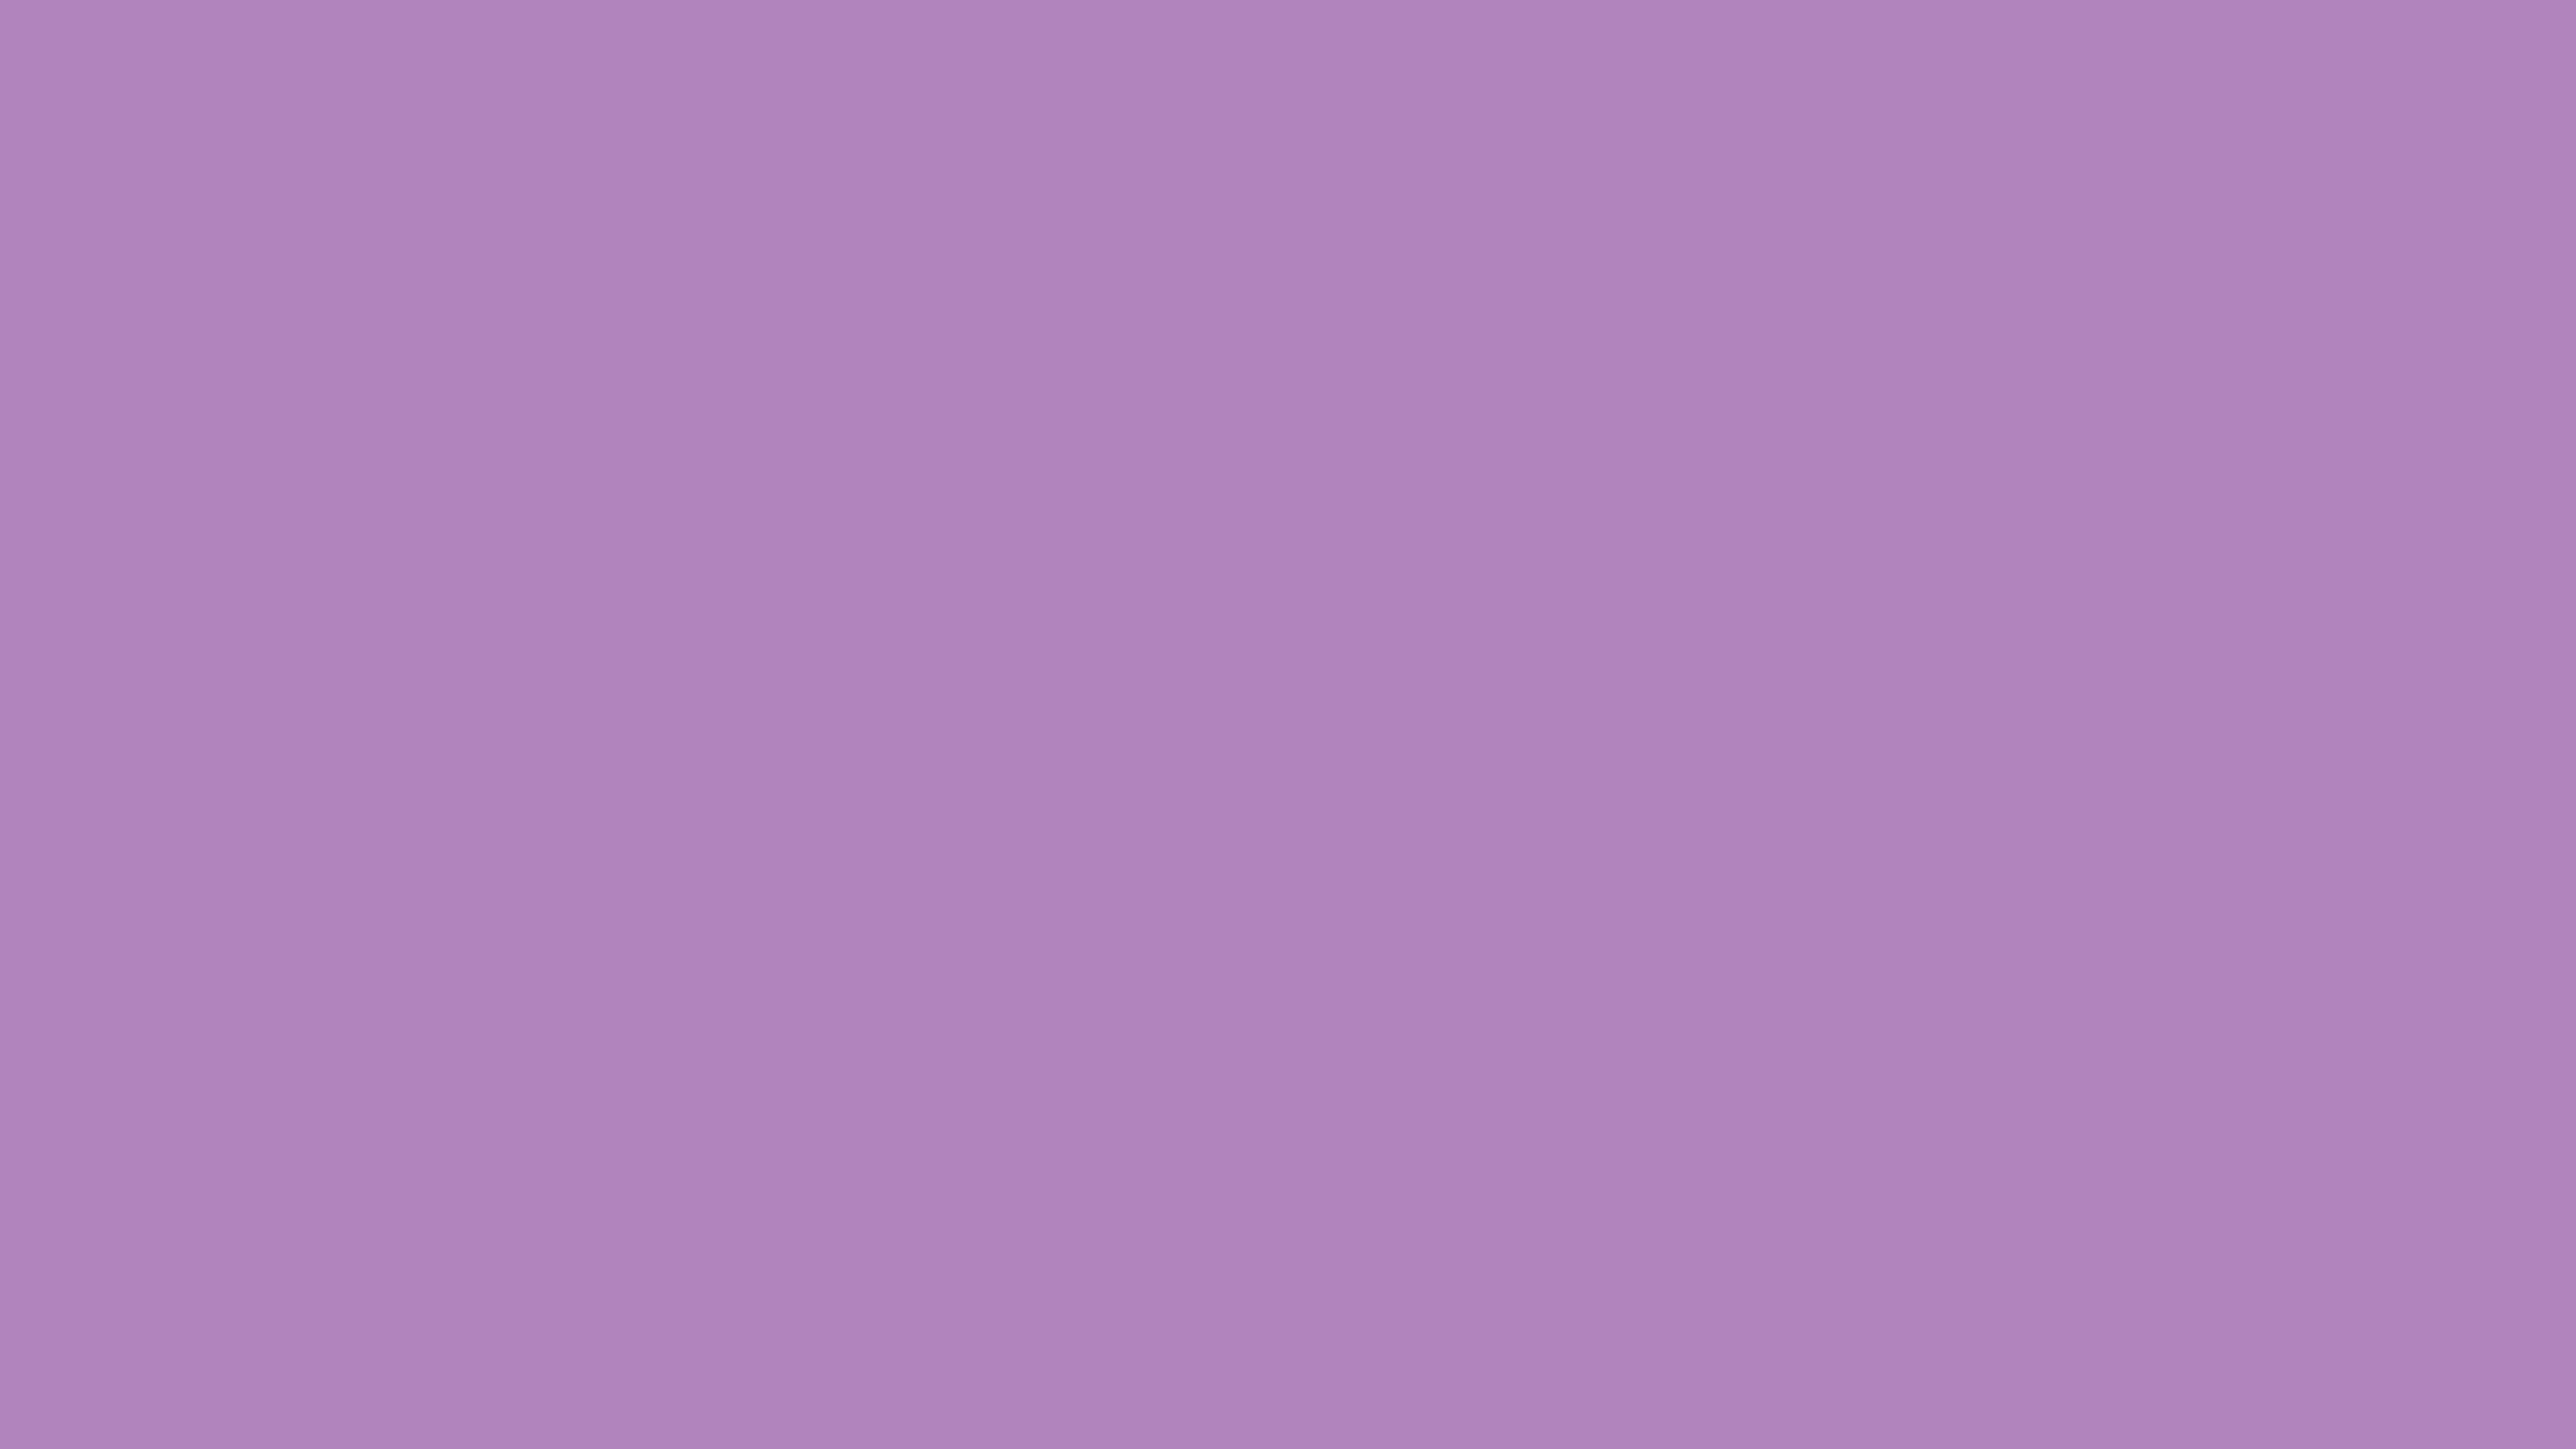 4096x2304 African Violet Solid Color Background